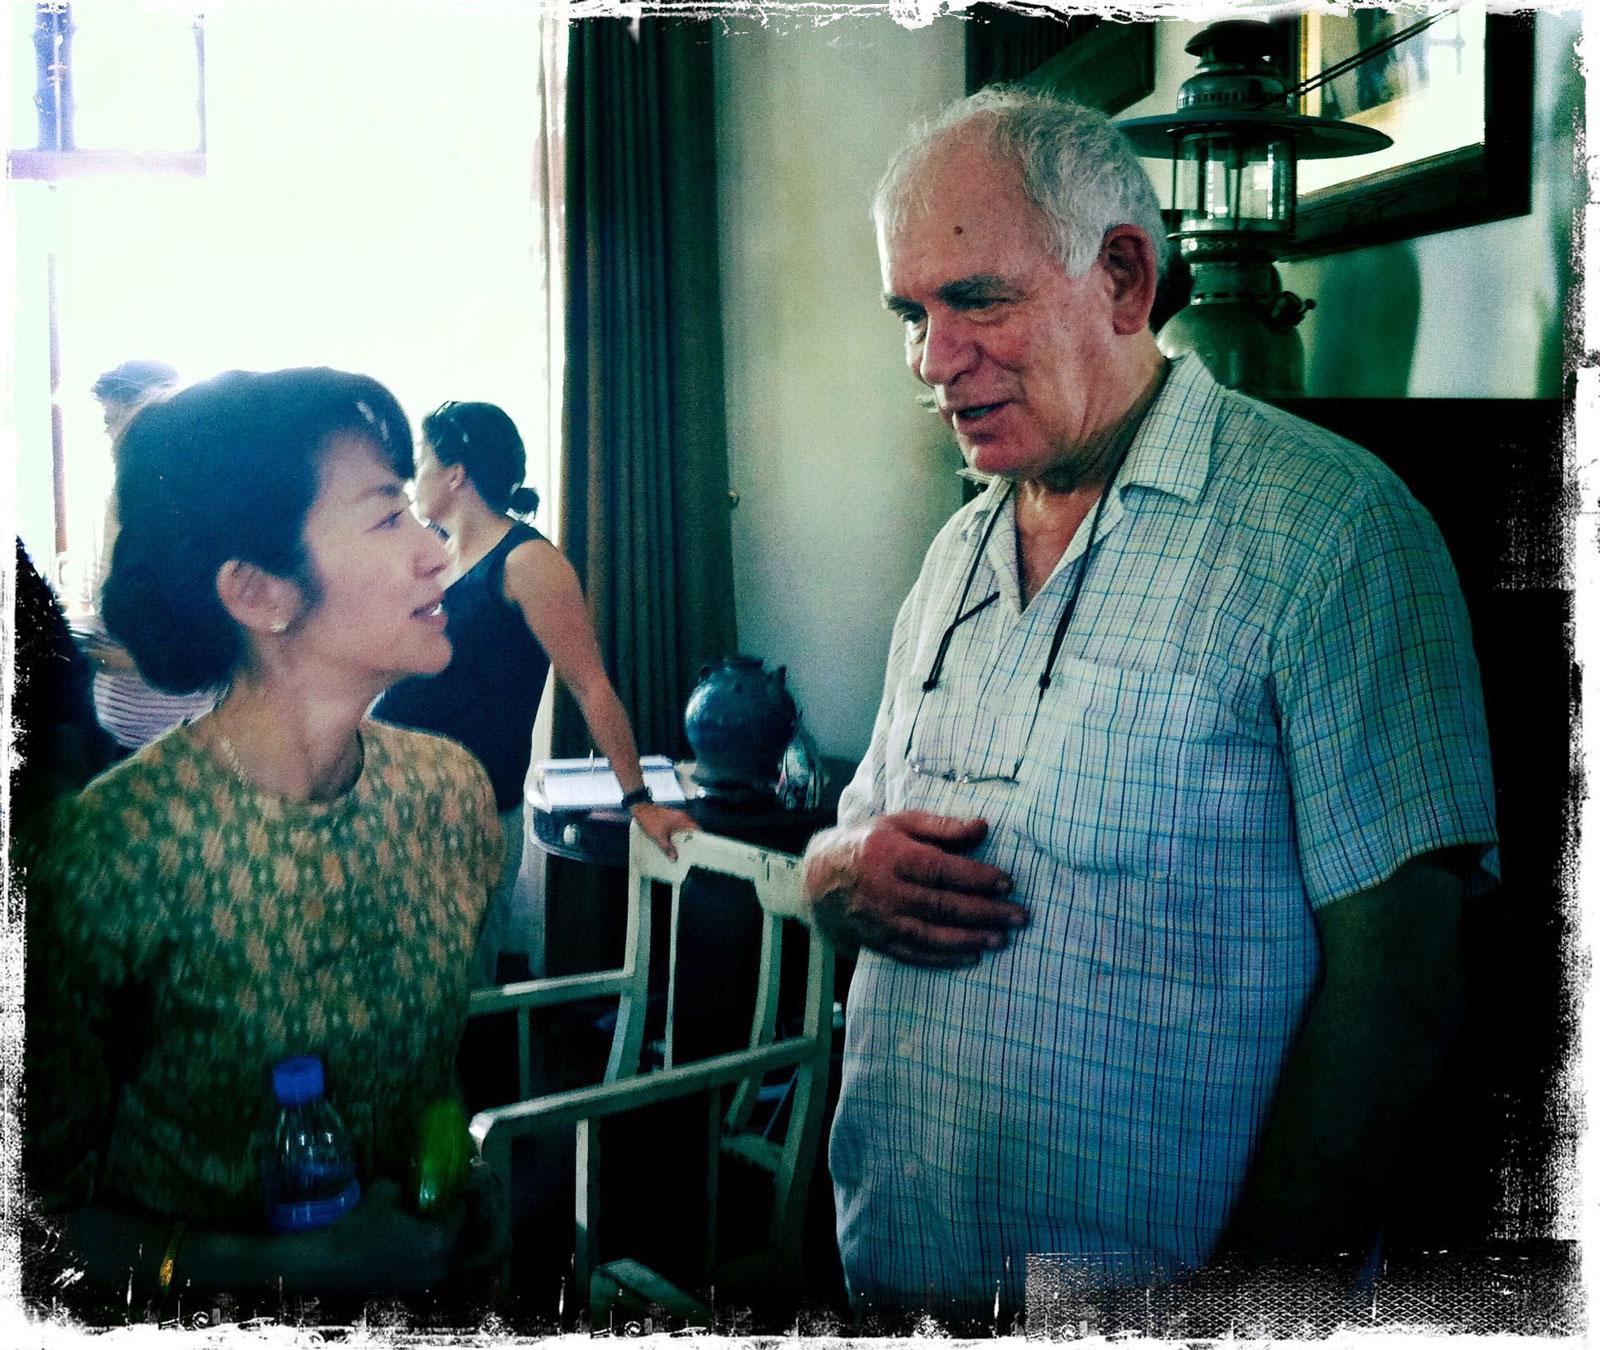 Q&A: The tragic character arc of Aung San Suu Kyi